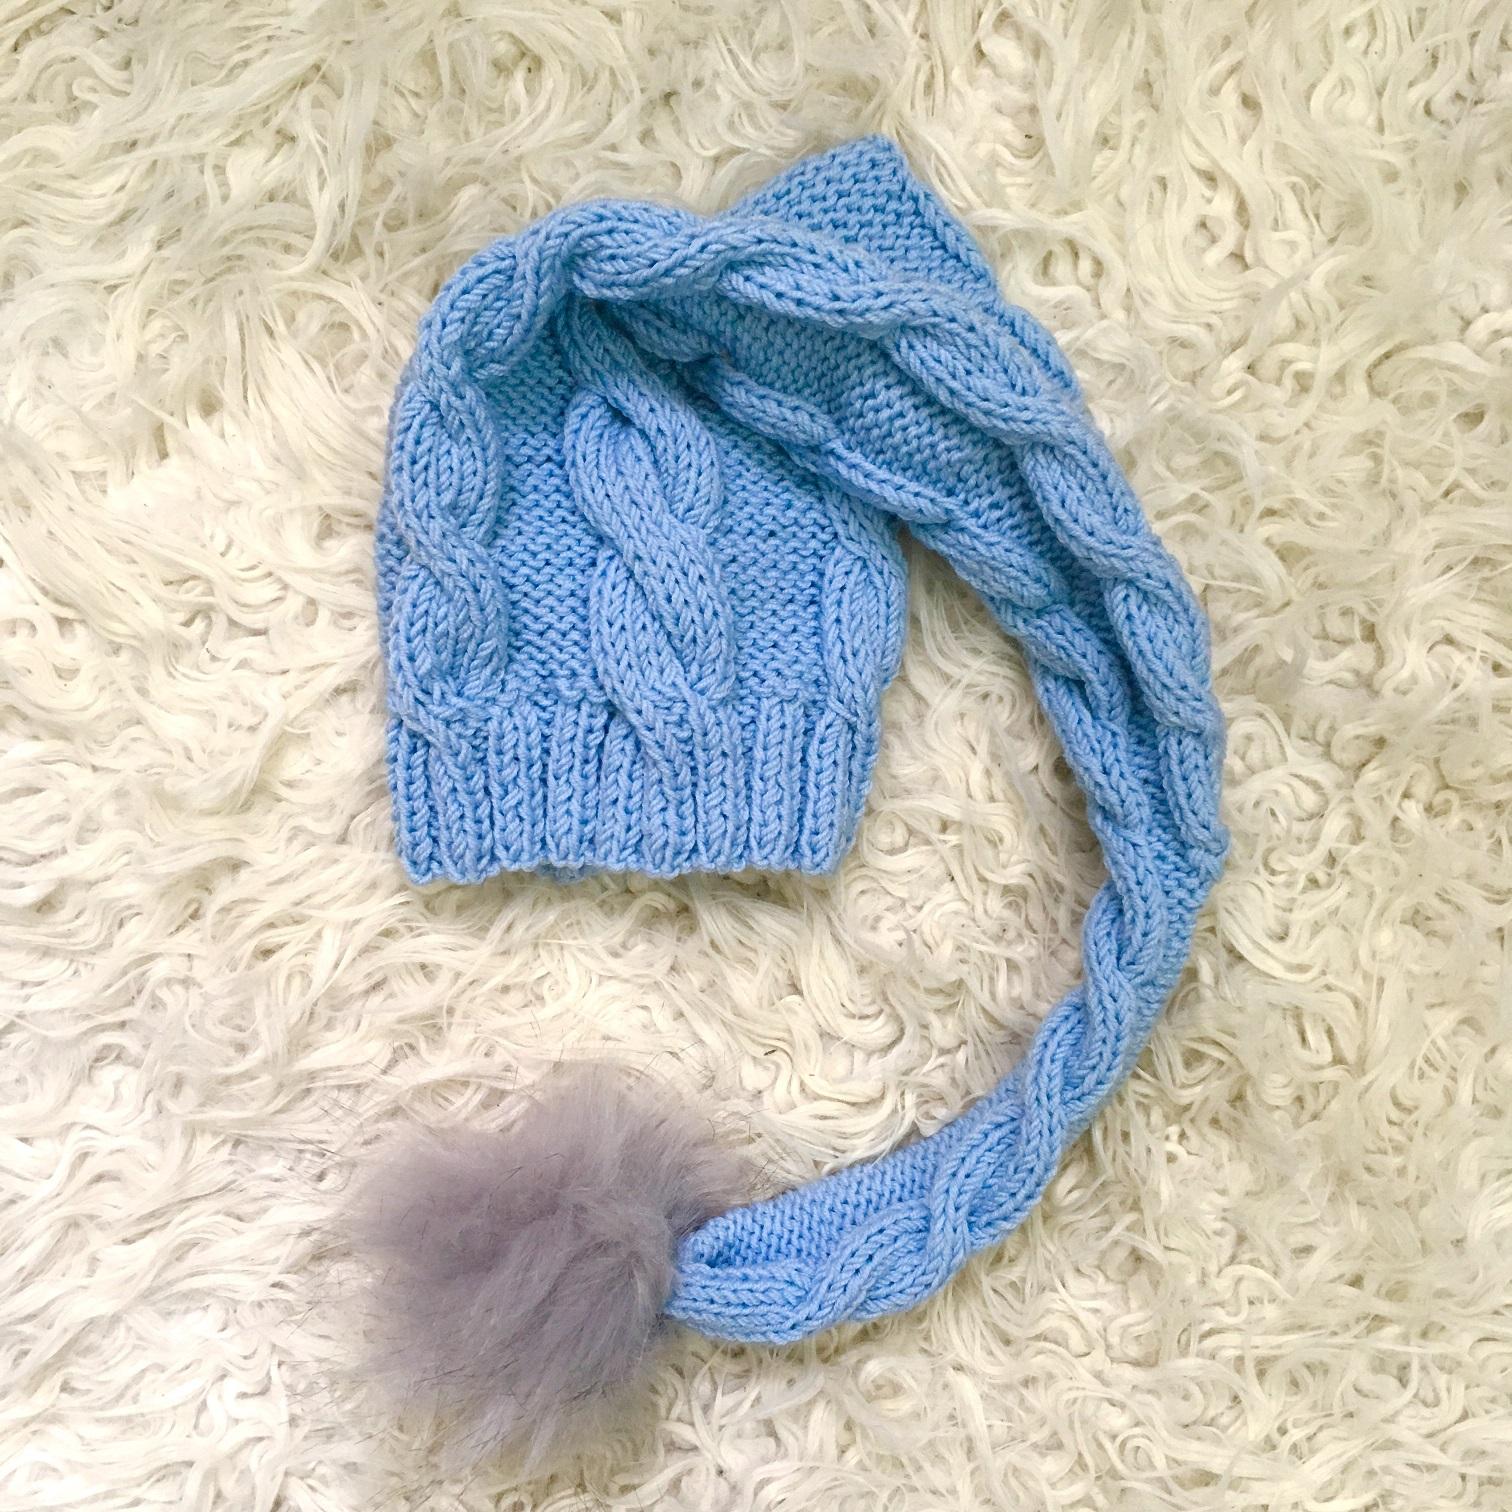 1e1d85c92bb2 Detská čiapka s brmbolcom pre bábätko modrá - jupitershop.sk